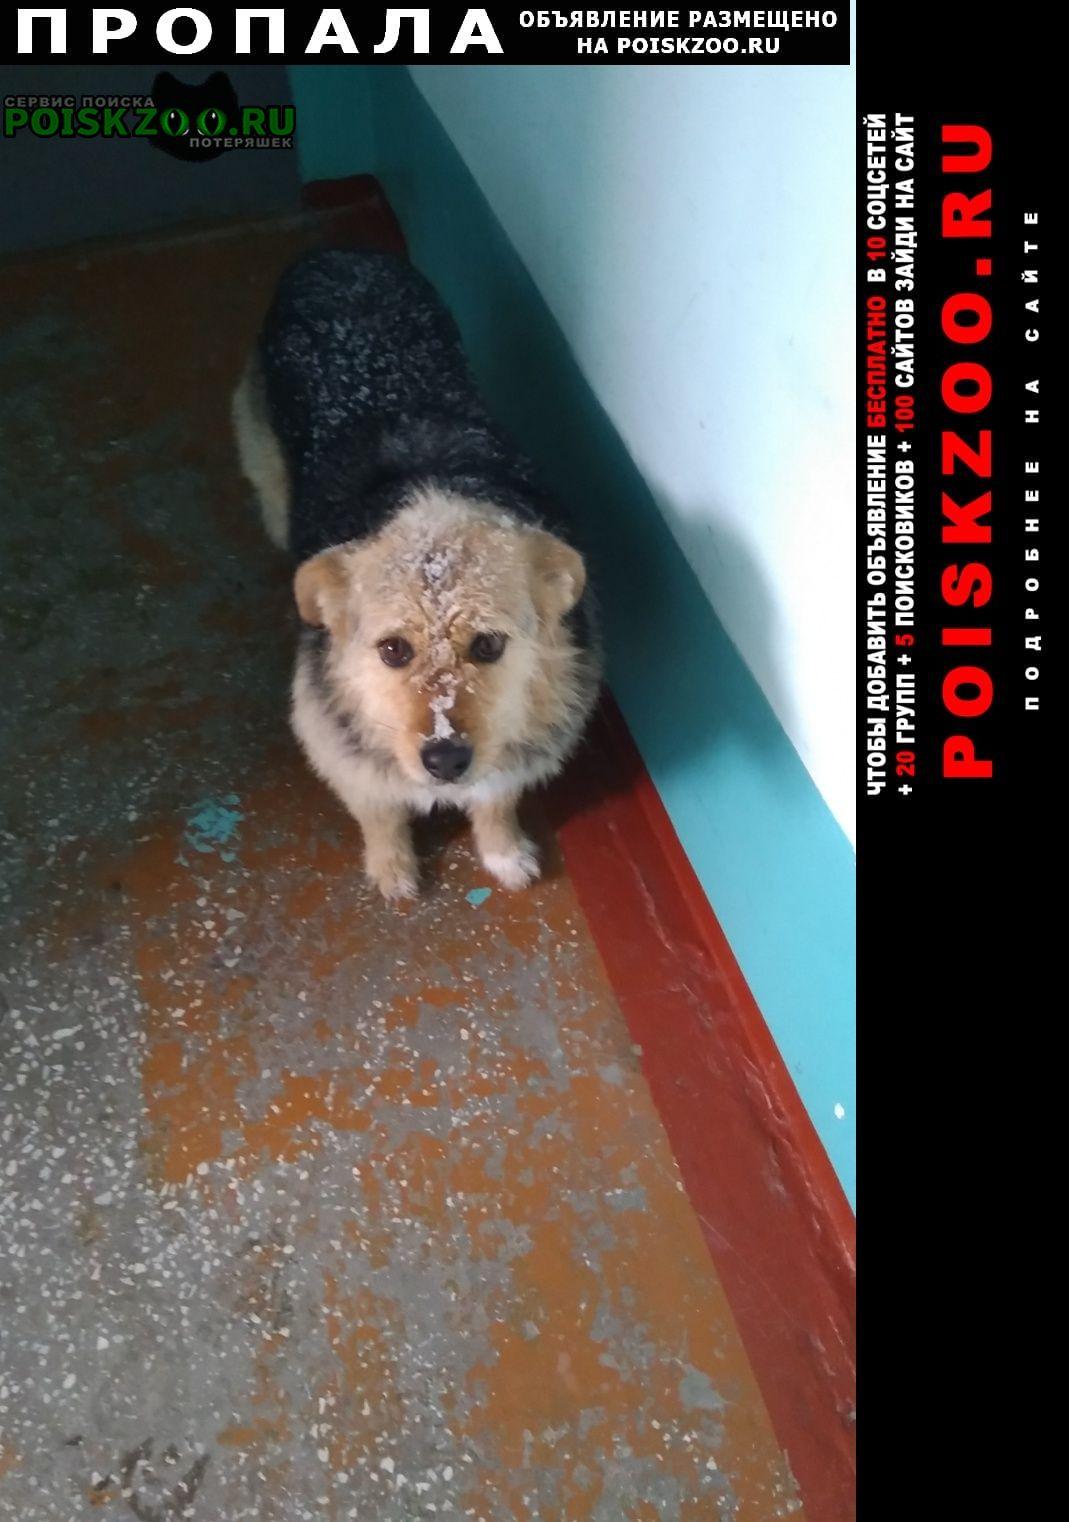 Пропала собака Омск